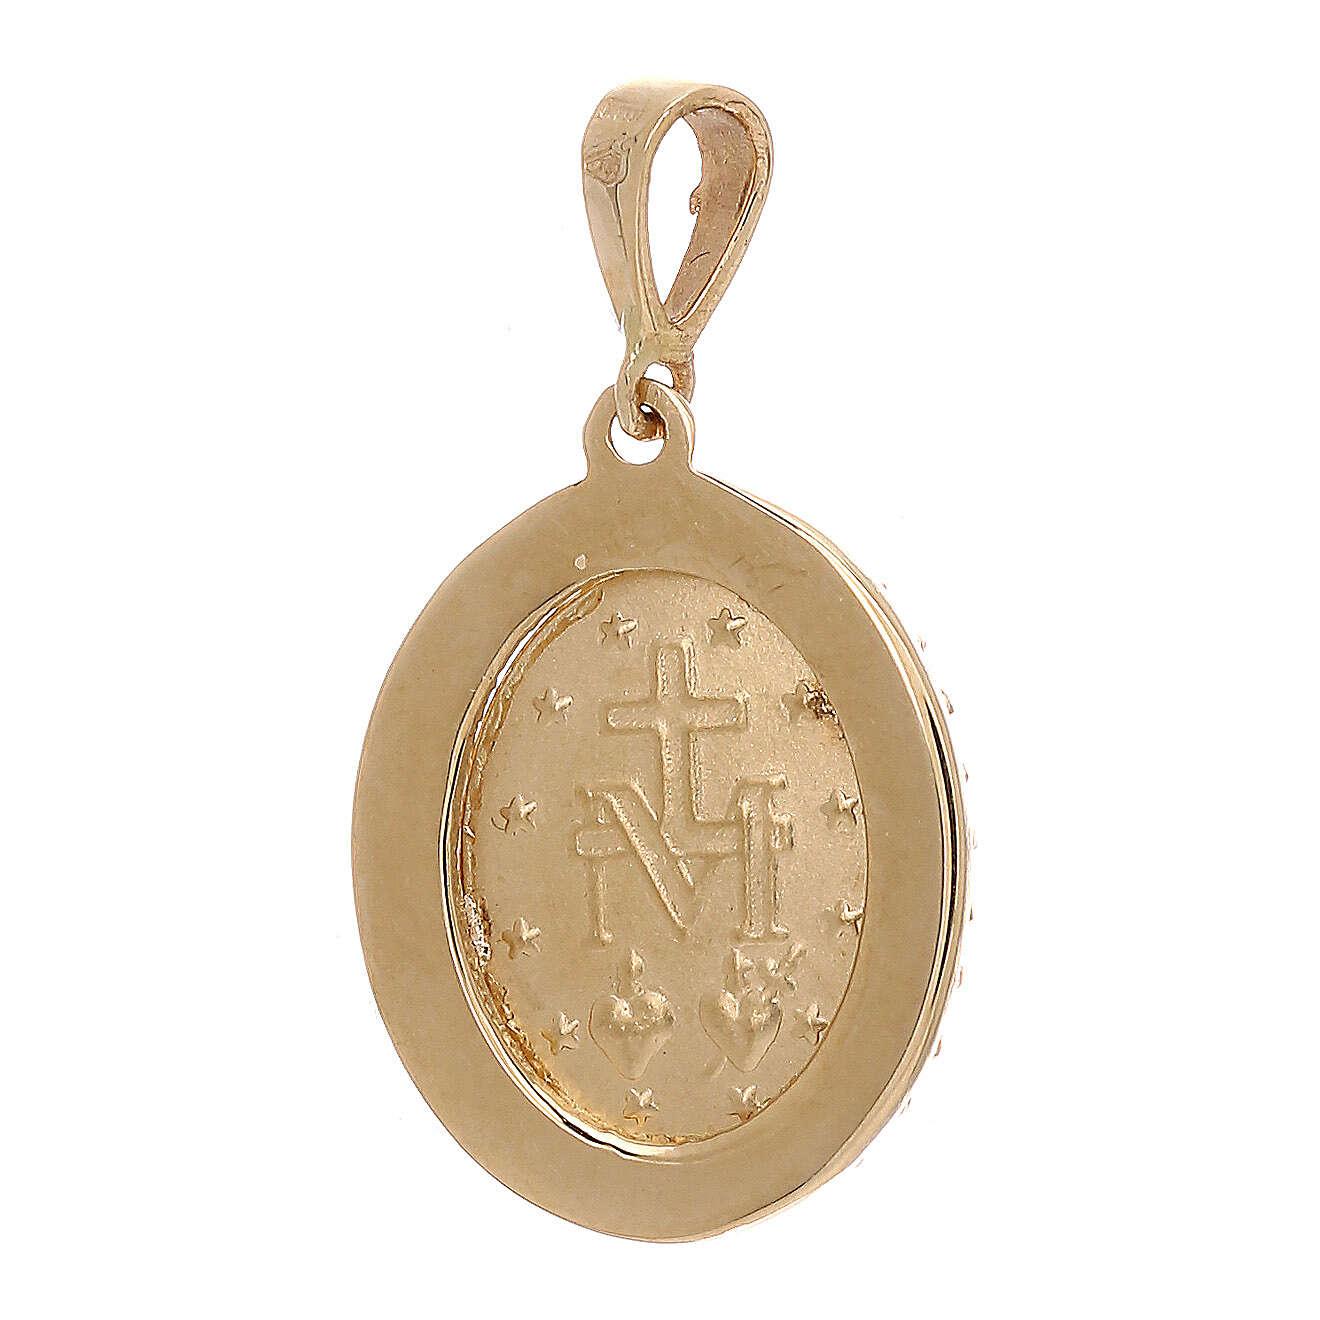 Pingente Medalha Milagrosa ouro amarelo Swarovski 2,6 gr 4